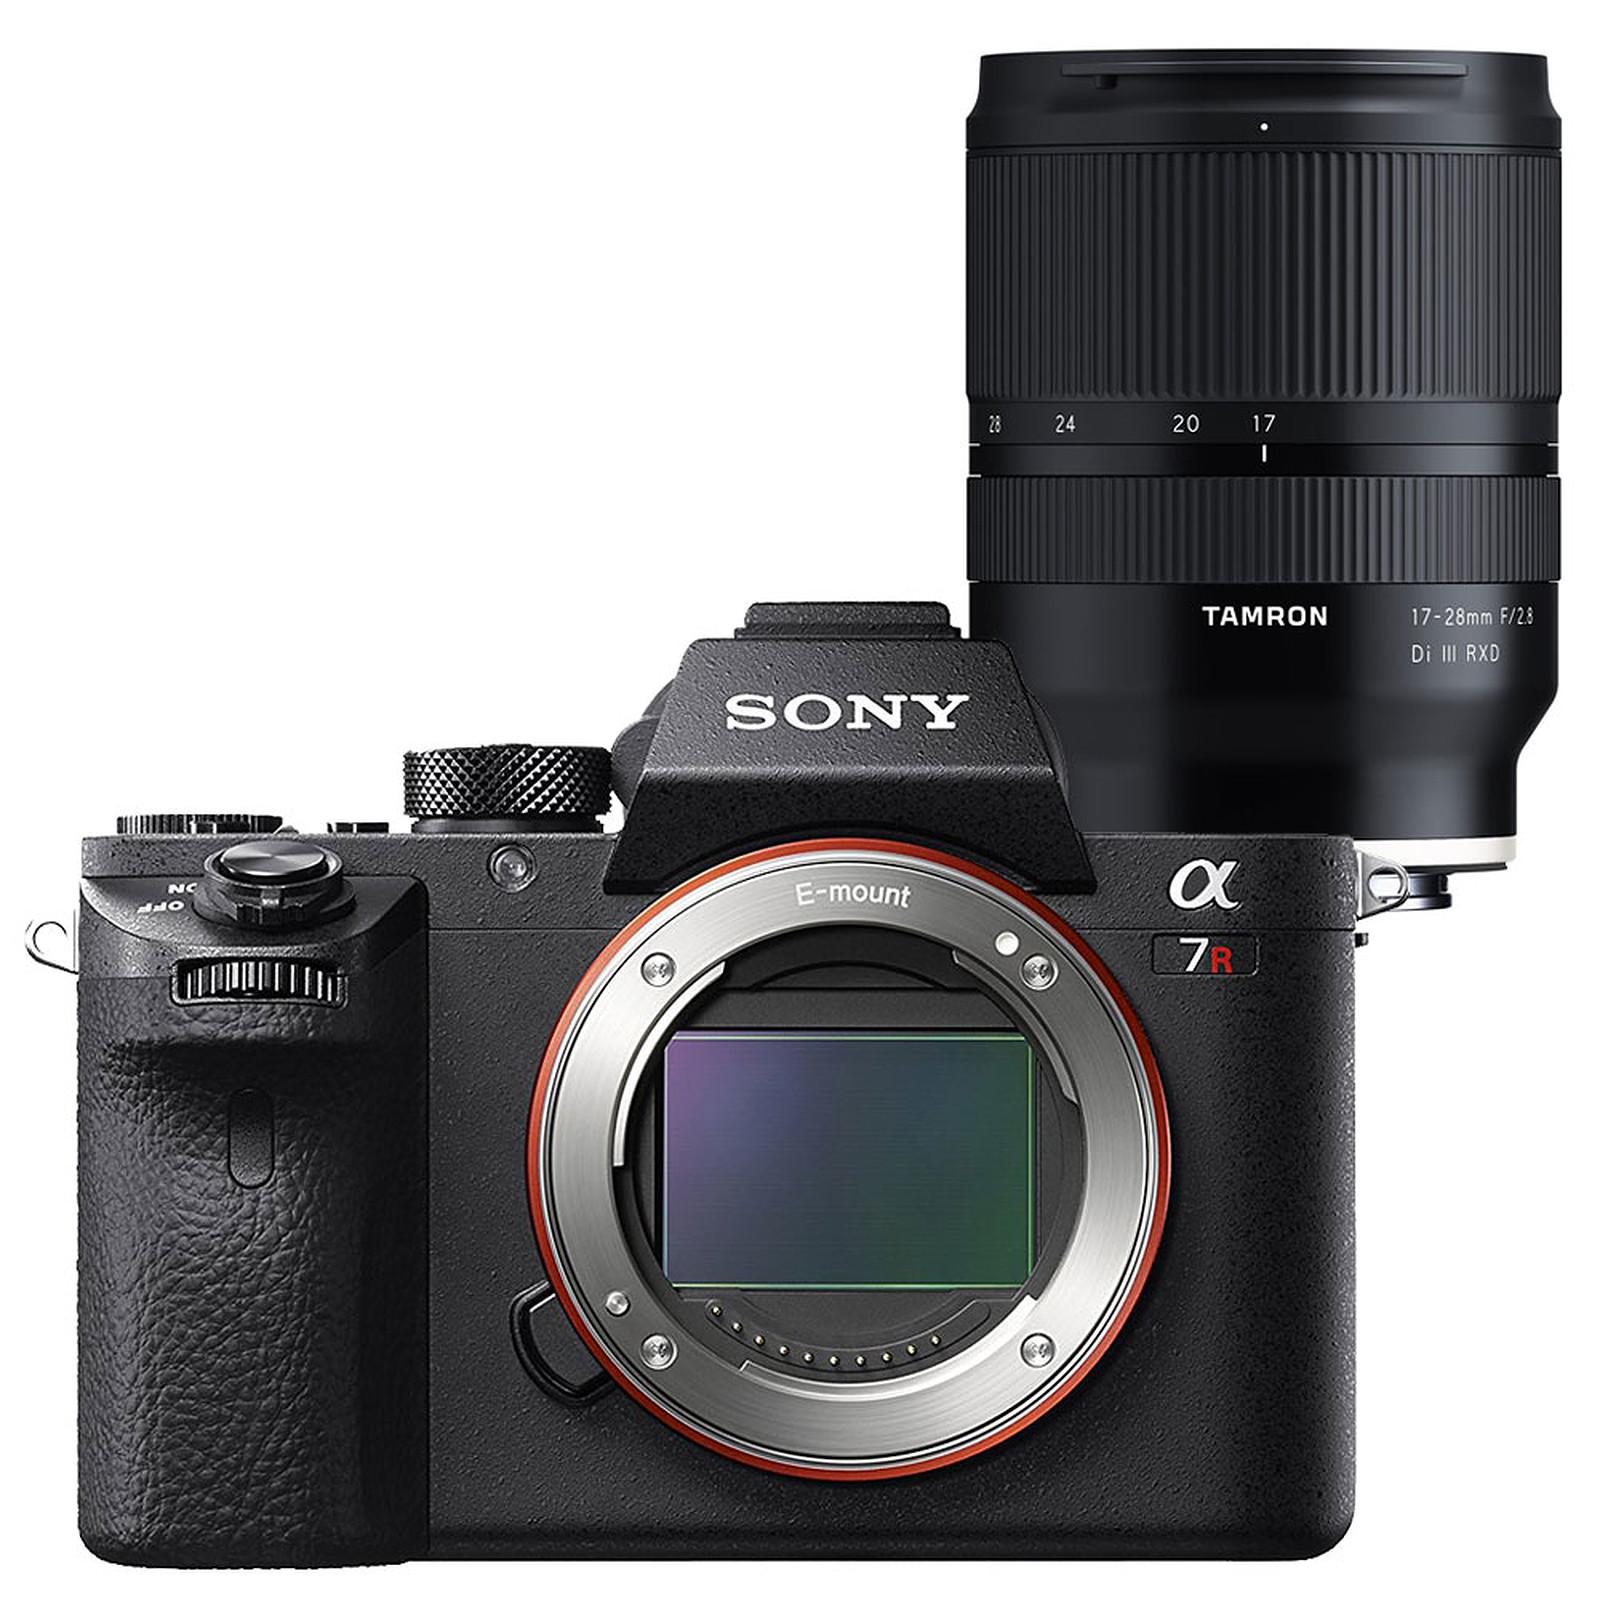 Sony Alpha 7R II + Tamron 17-28mm F/2.8 Di III RXD